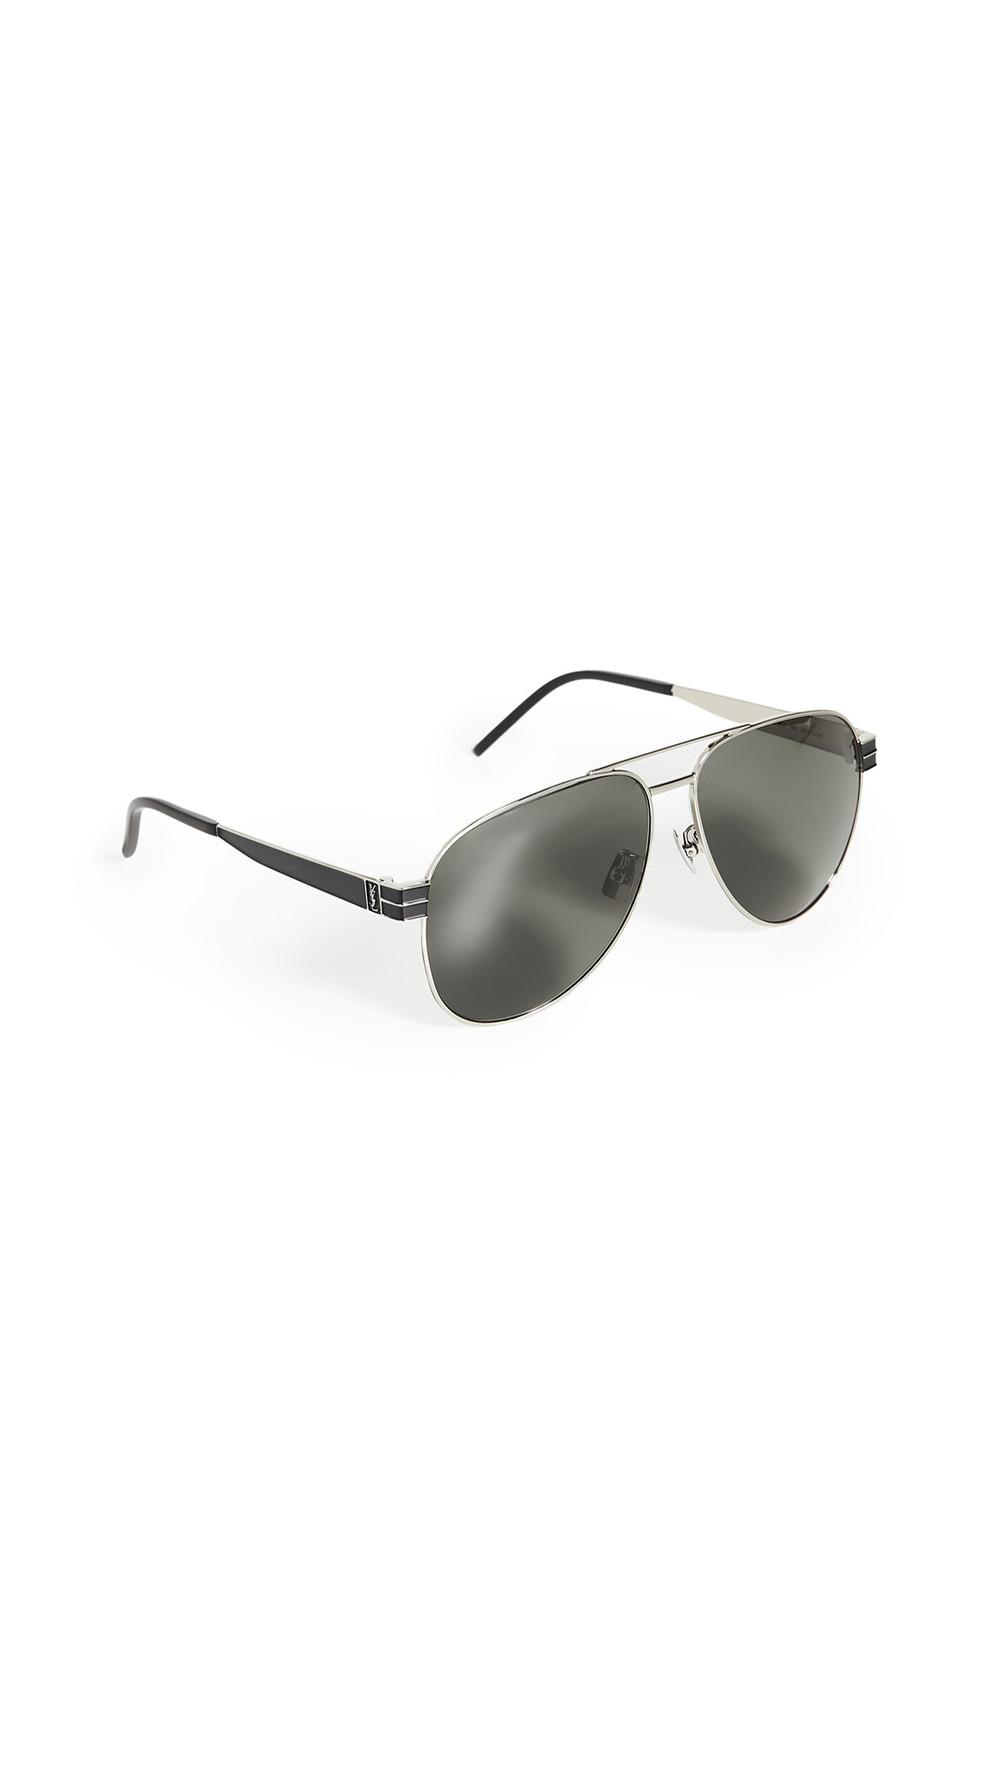 Saint Laurent Pilot Aviator Sunglasses in grey / silver